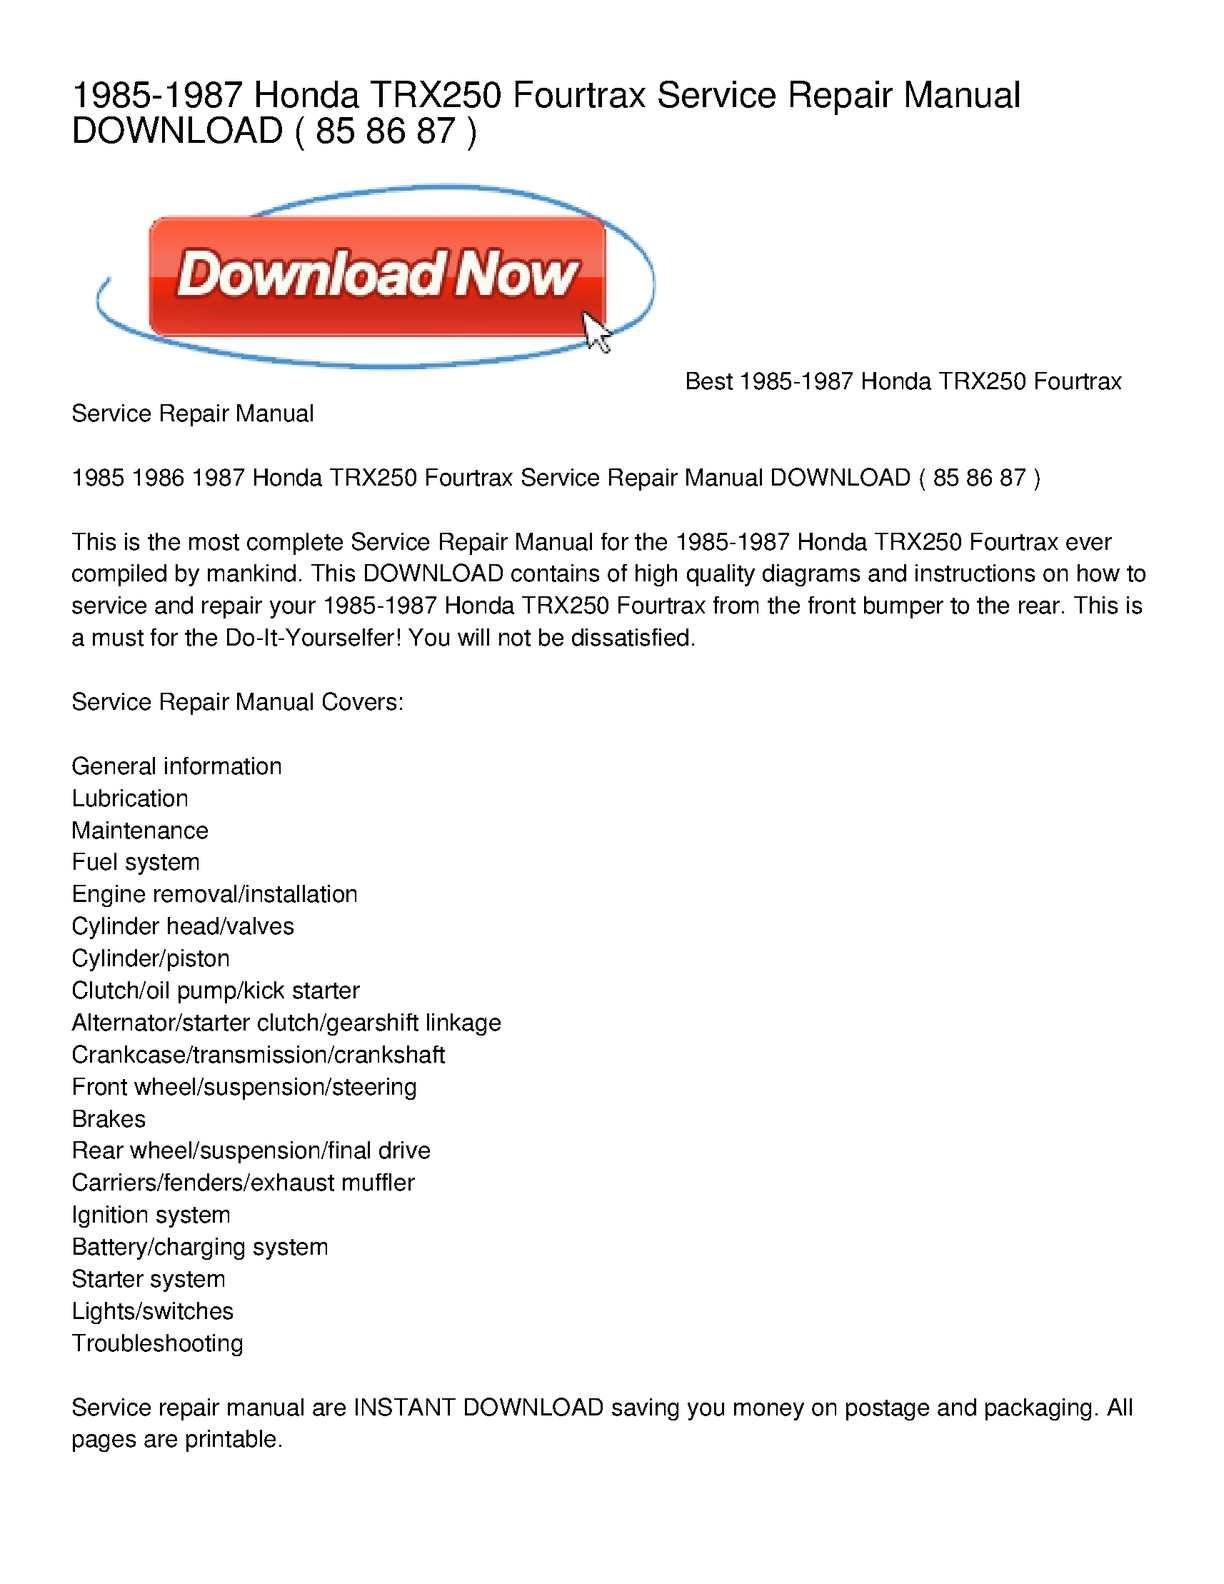 Fb405d Honda Trx 250 1985 1987 Service Repair Manuals Download Wiring Library